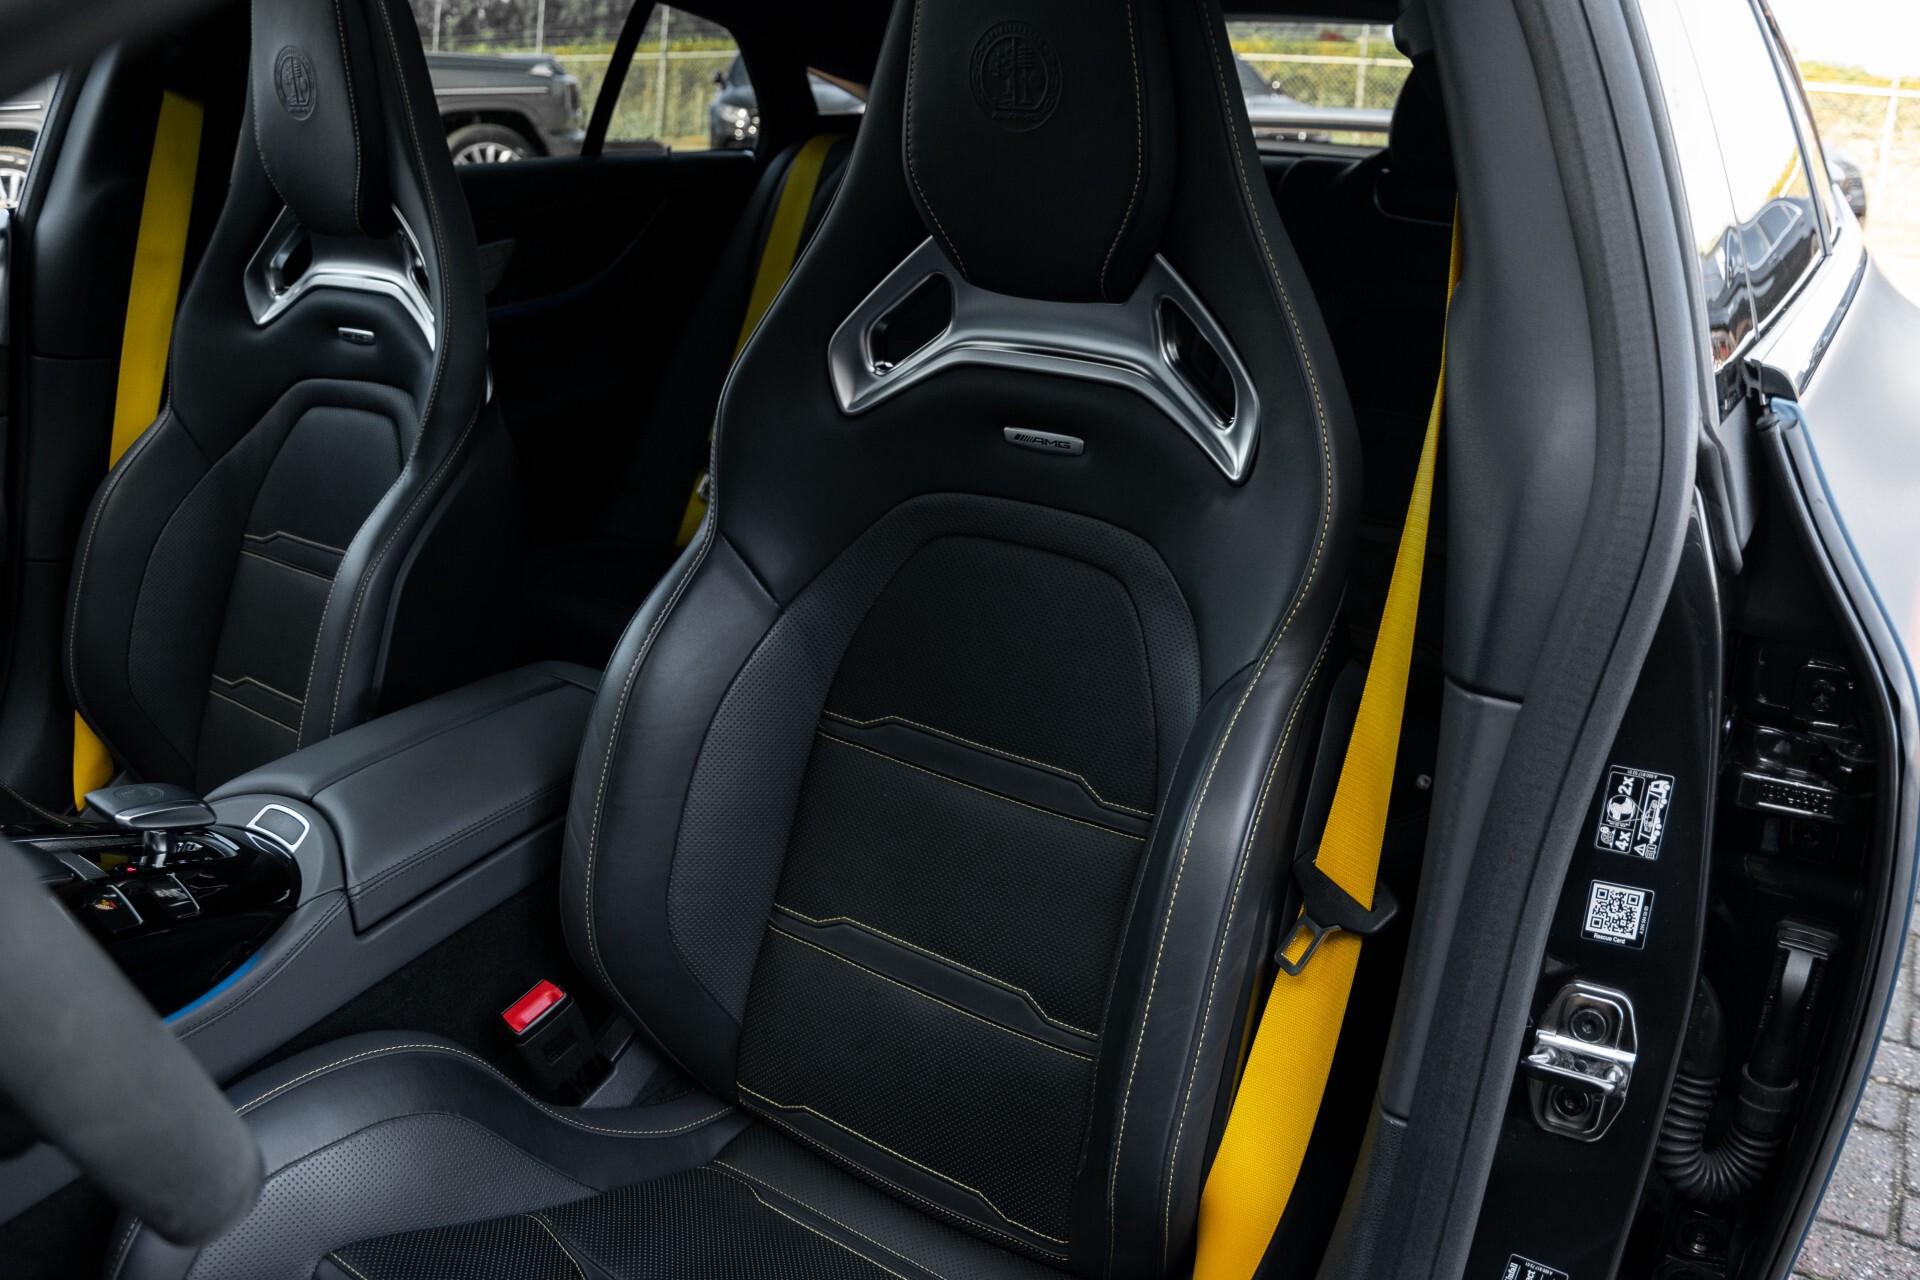 Mercedes-Benz AMG GT 4-Door Coupe 63 S 4MATIC+ Edition 1 Keramisch/Carbon/First Class/Dynamic Plus/Burmester High End 3D Aut9 Foto 65